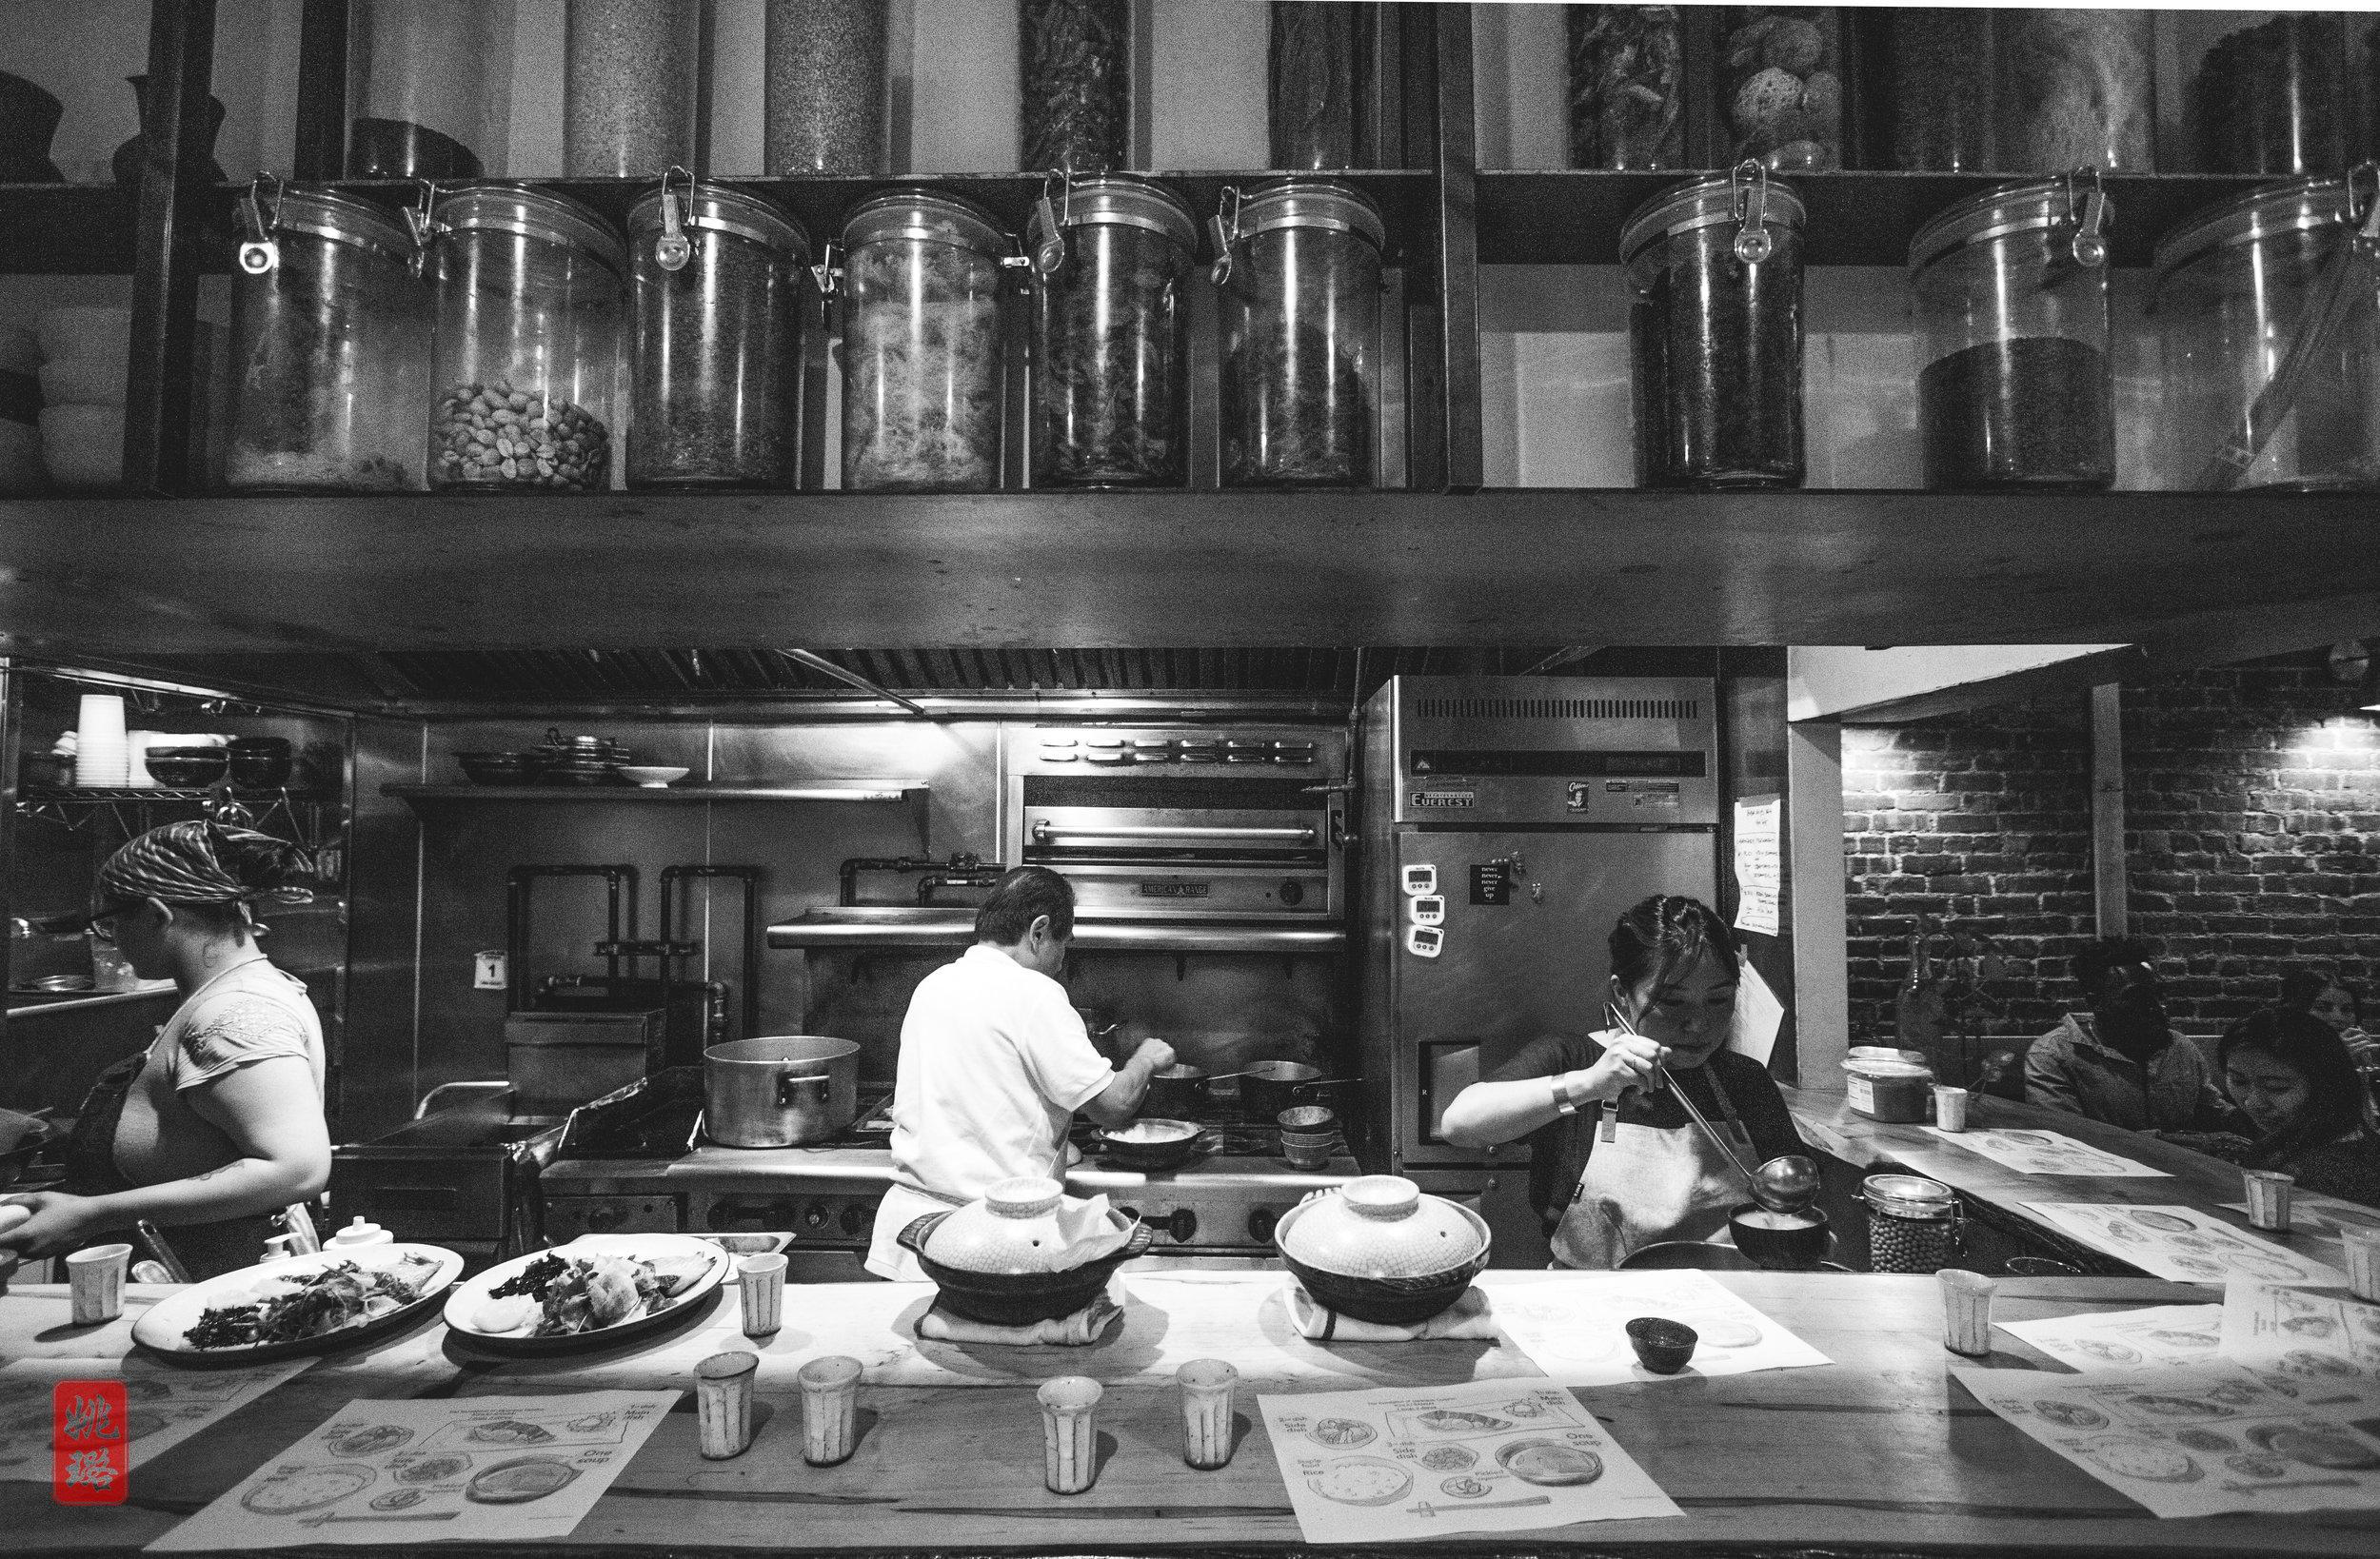 IMG_4503 Bessou - cooking.jpg